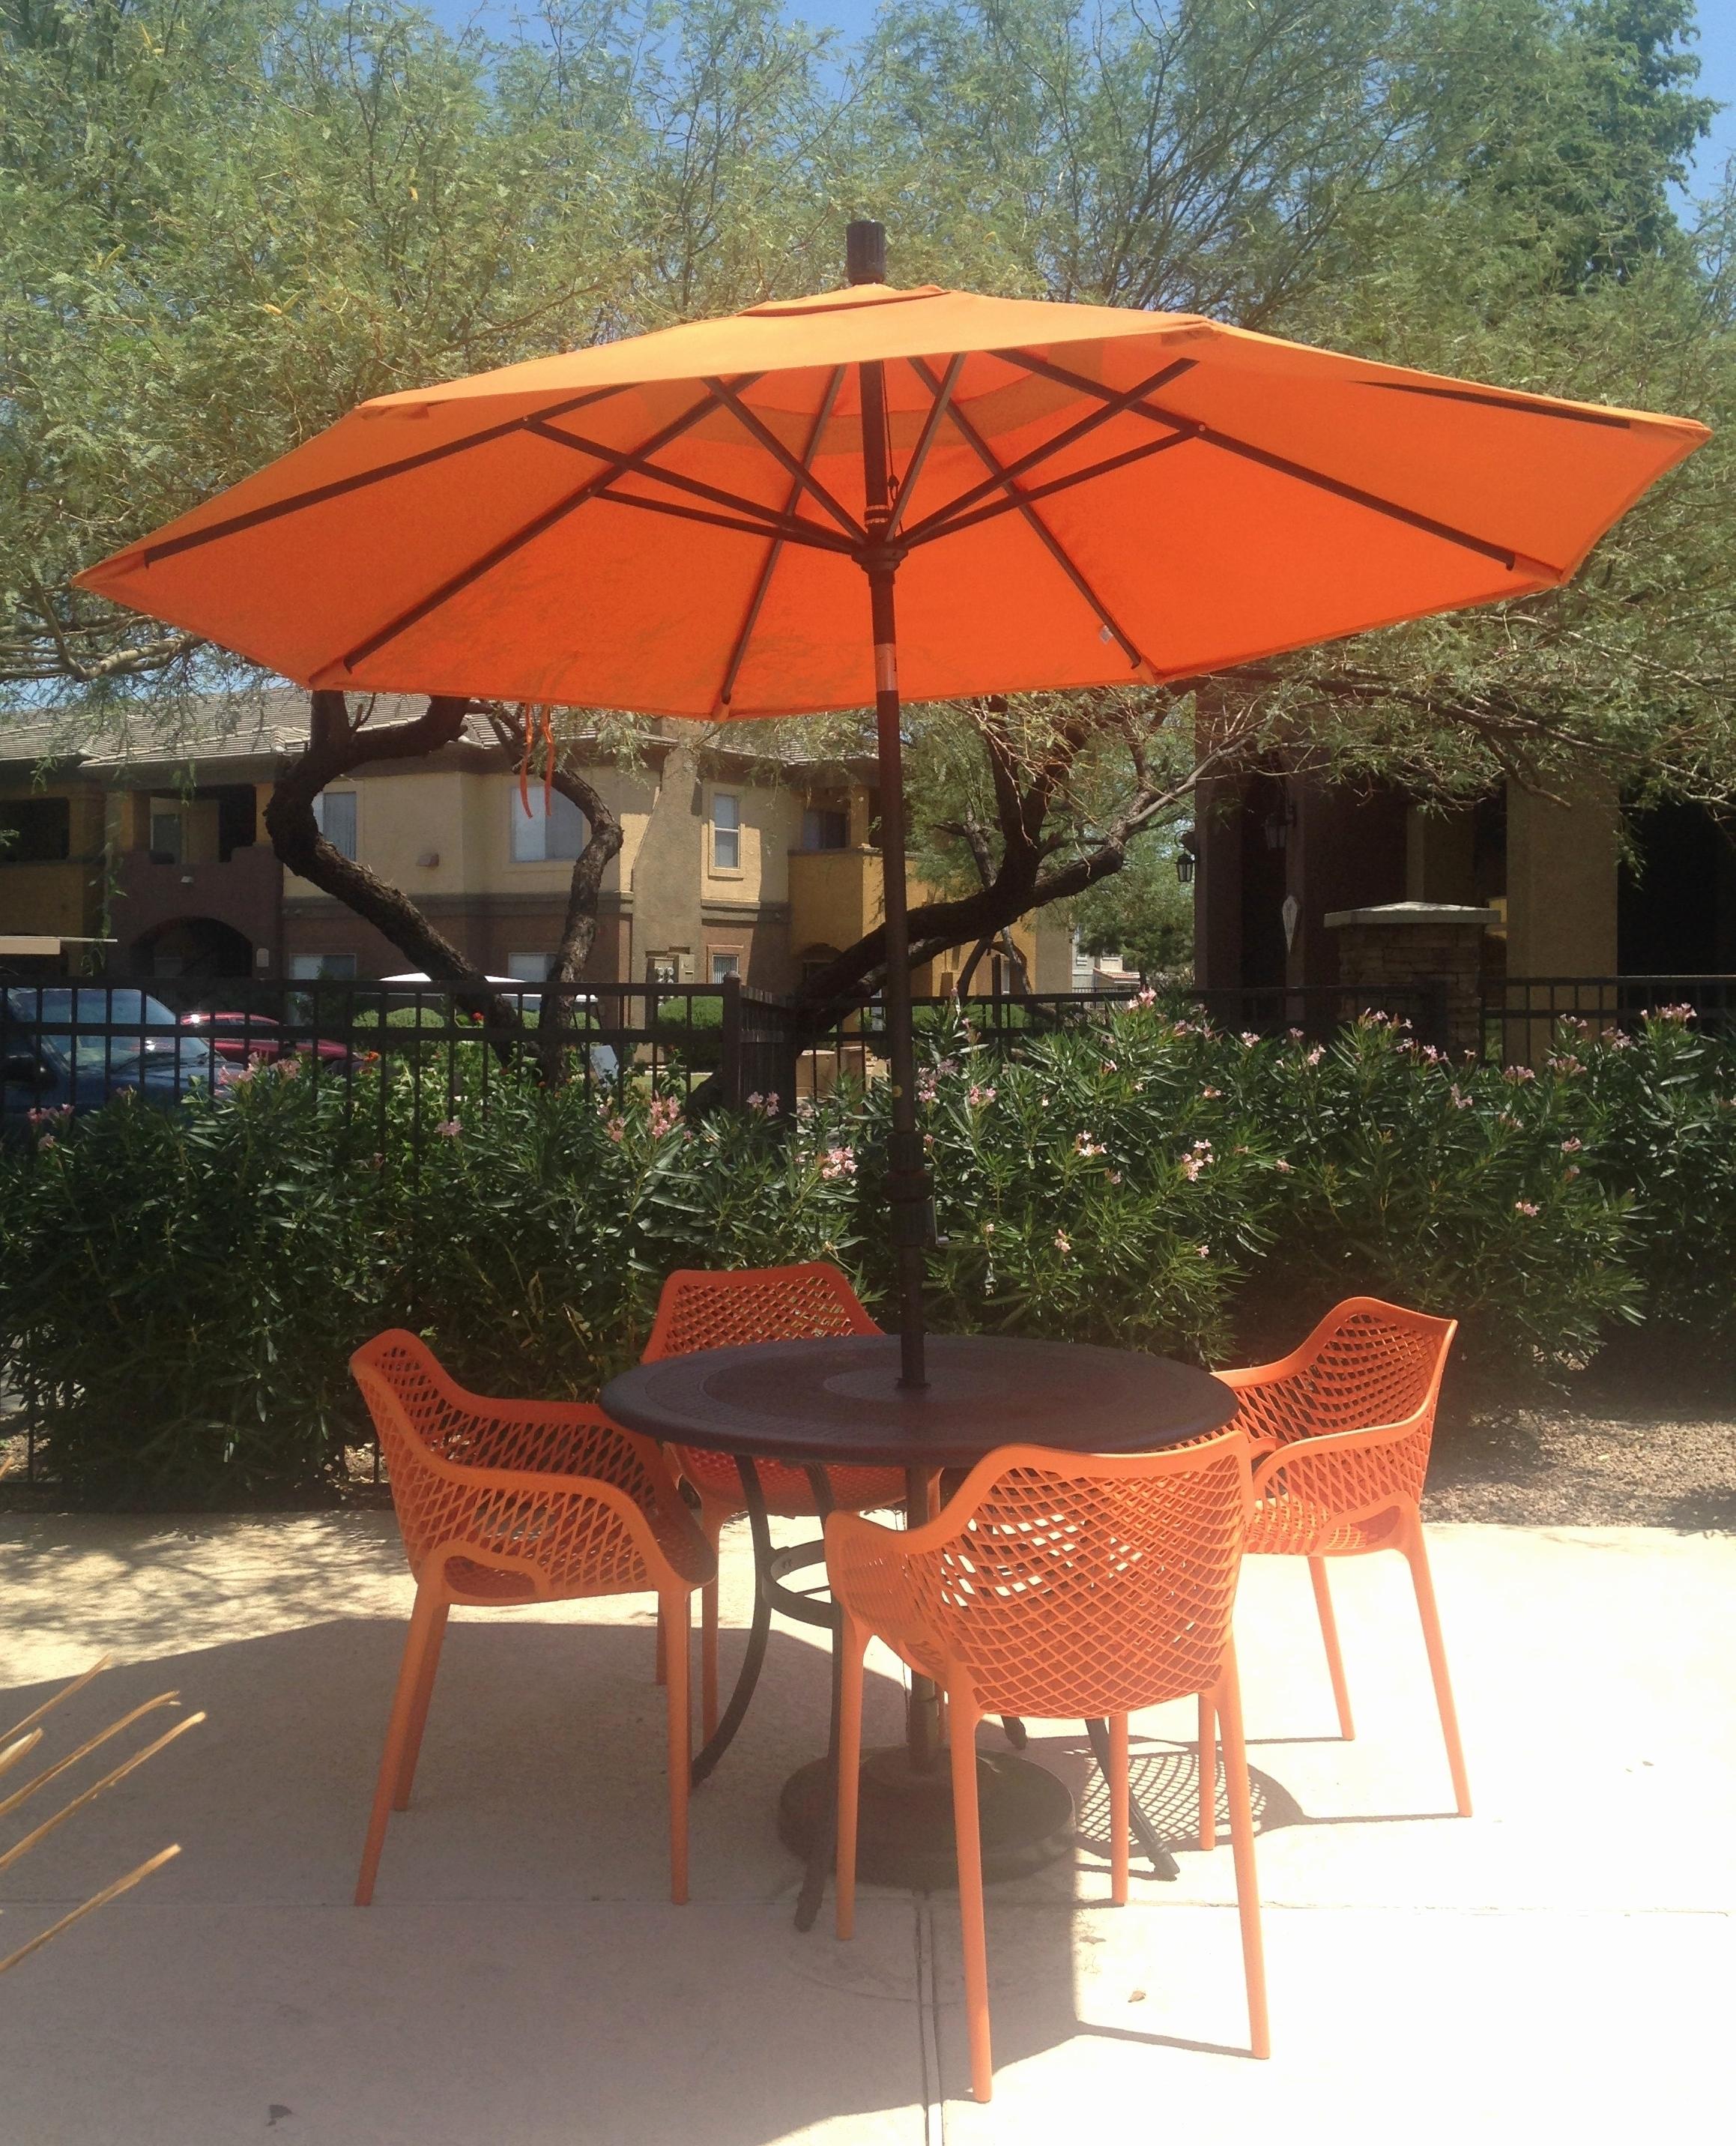 Elegant Vintage Patio Umbrella For Sale Graphics Home, Vintage Patio For Popular Vinyl Patio Umbrellas With Fringe (Gallery 2 of 20)